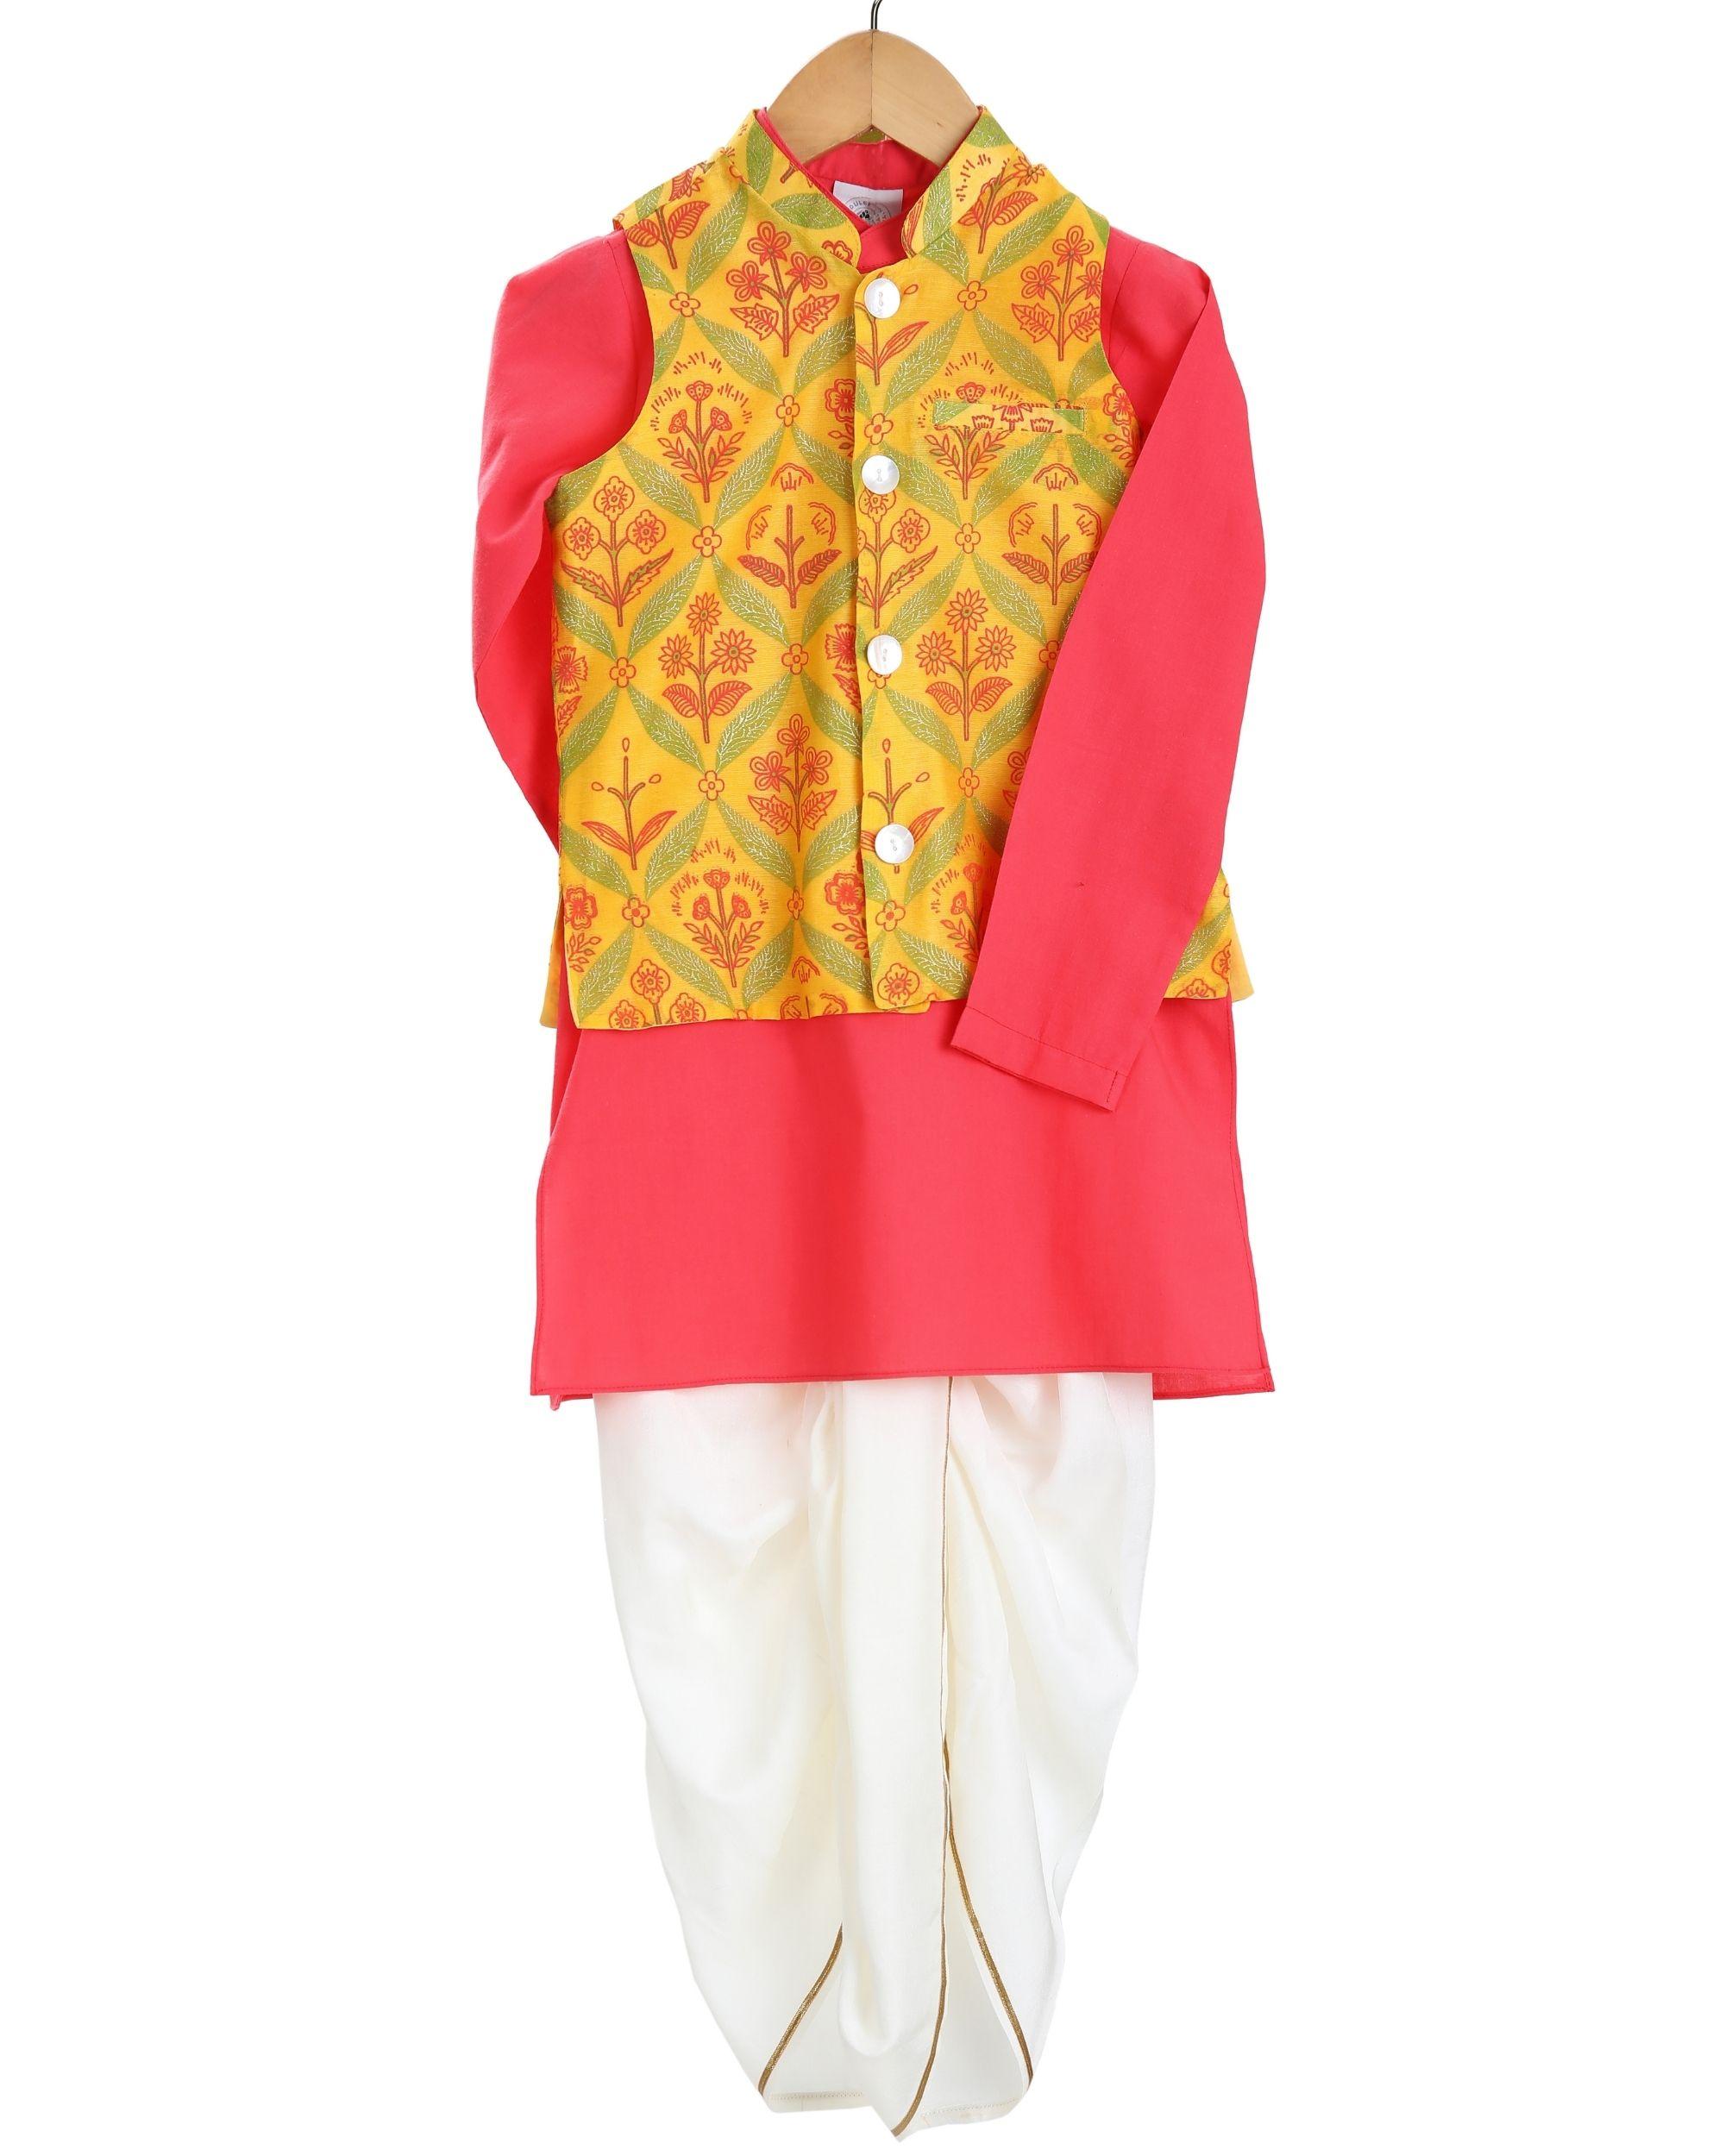 Red kurta and saffron printed jacket with white dhoti pants - set of three